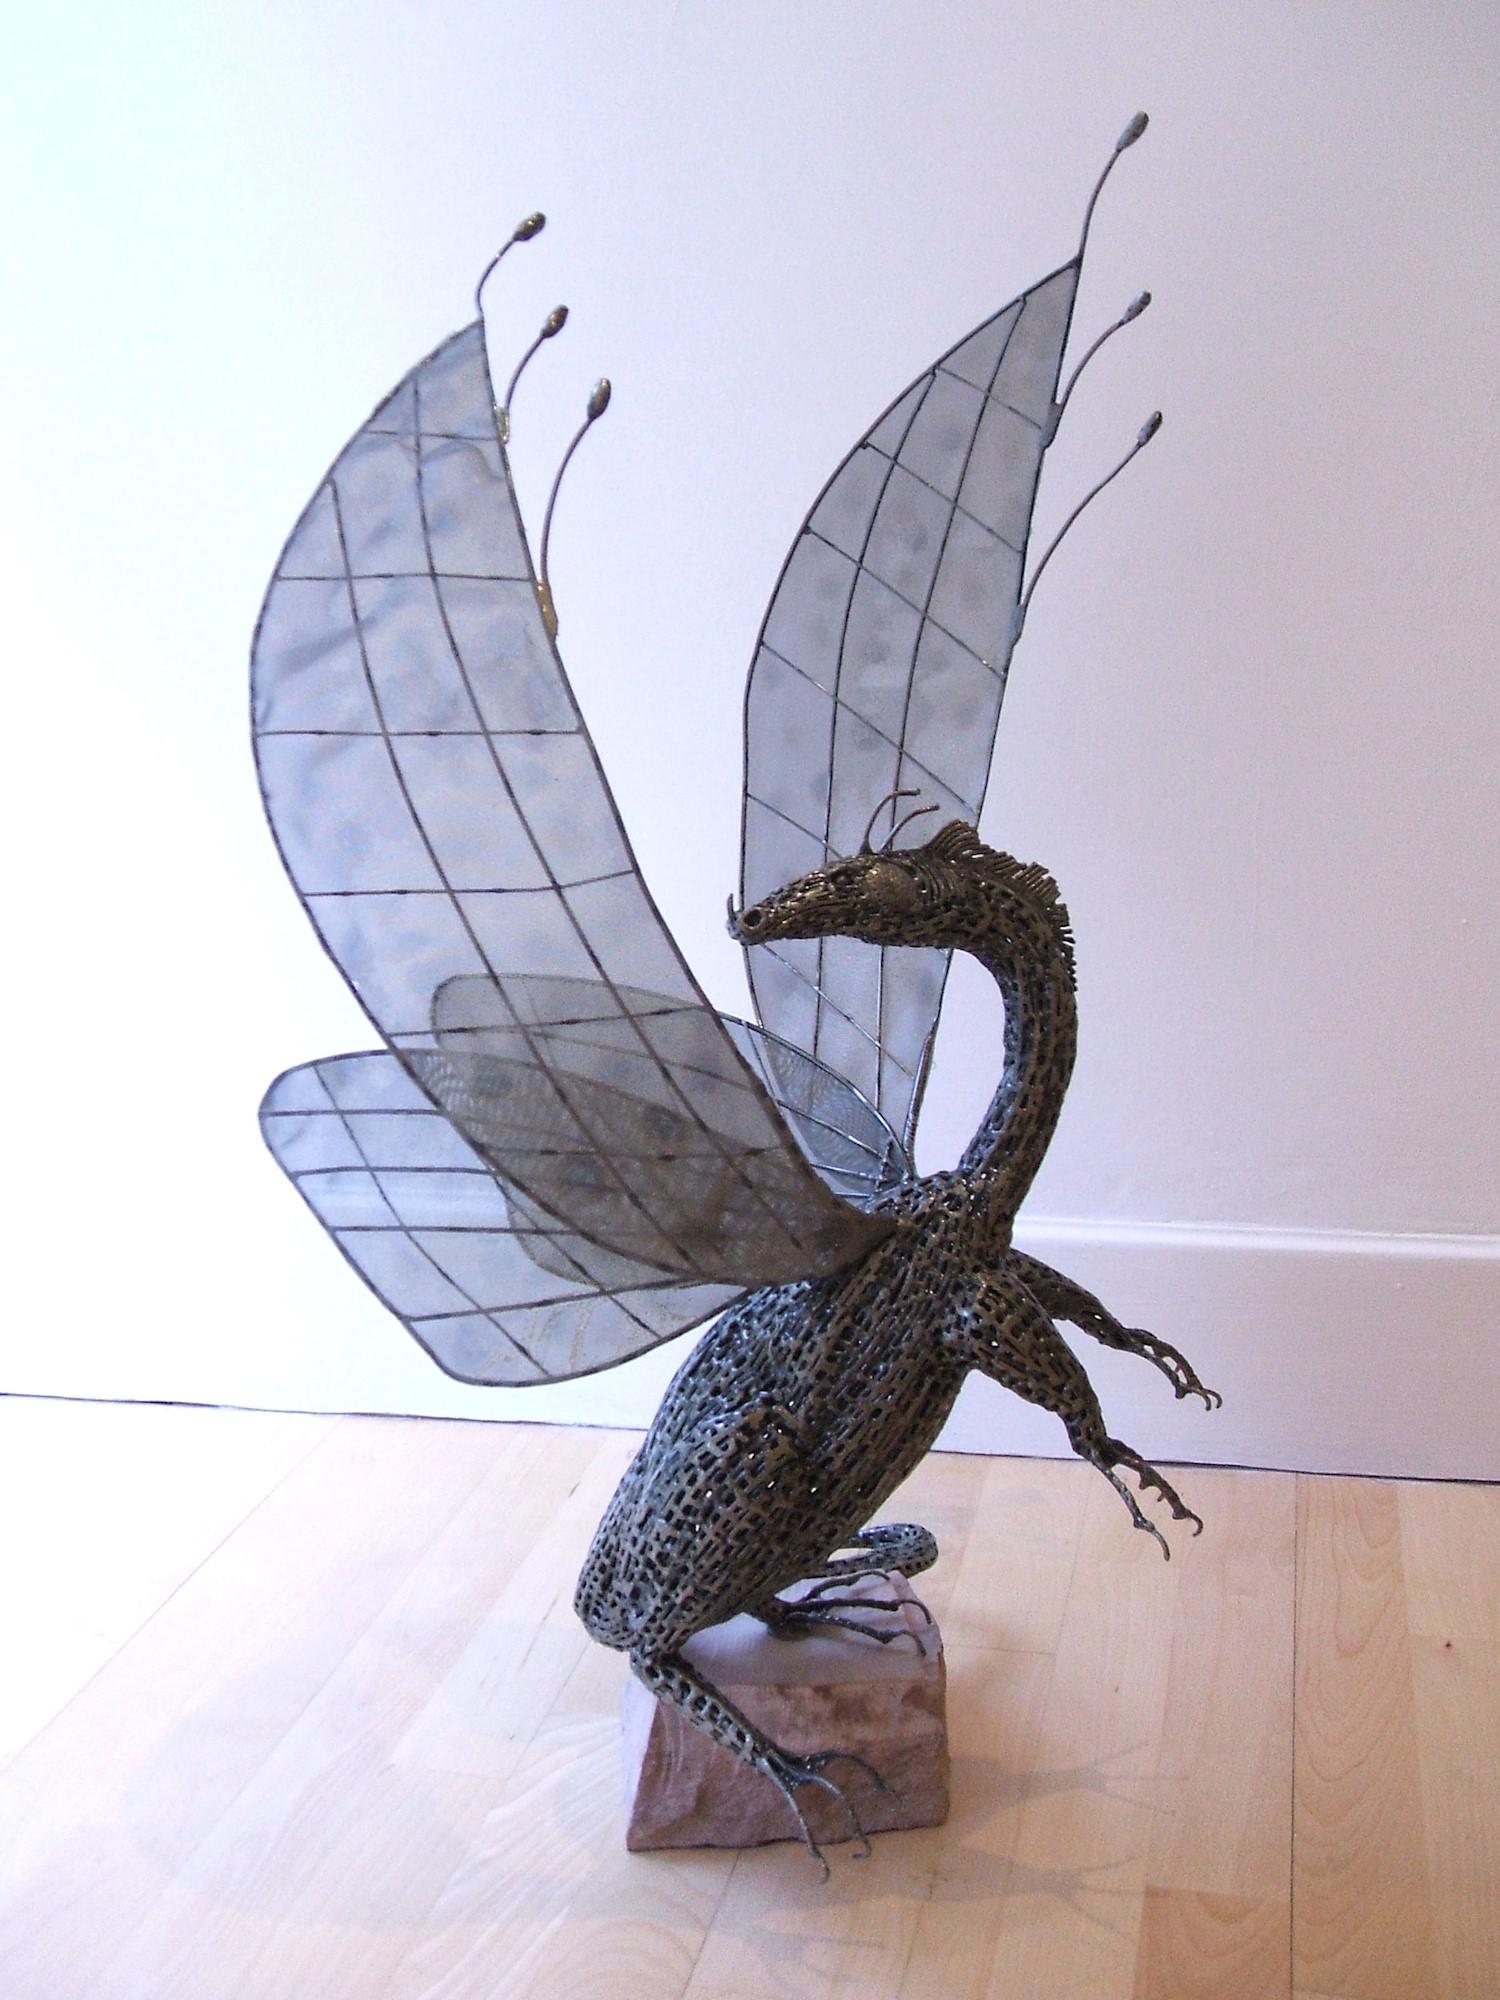 'Dragon' by artist Hamish Gilchrist